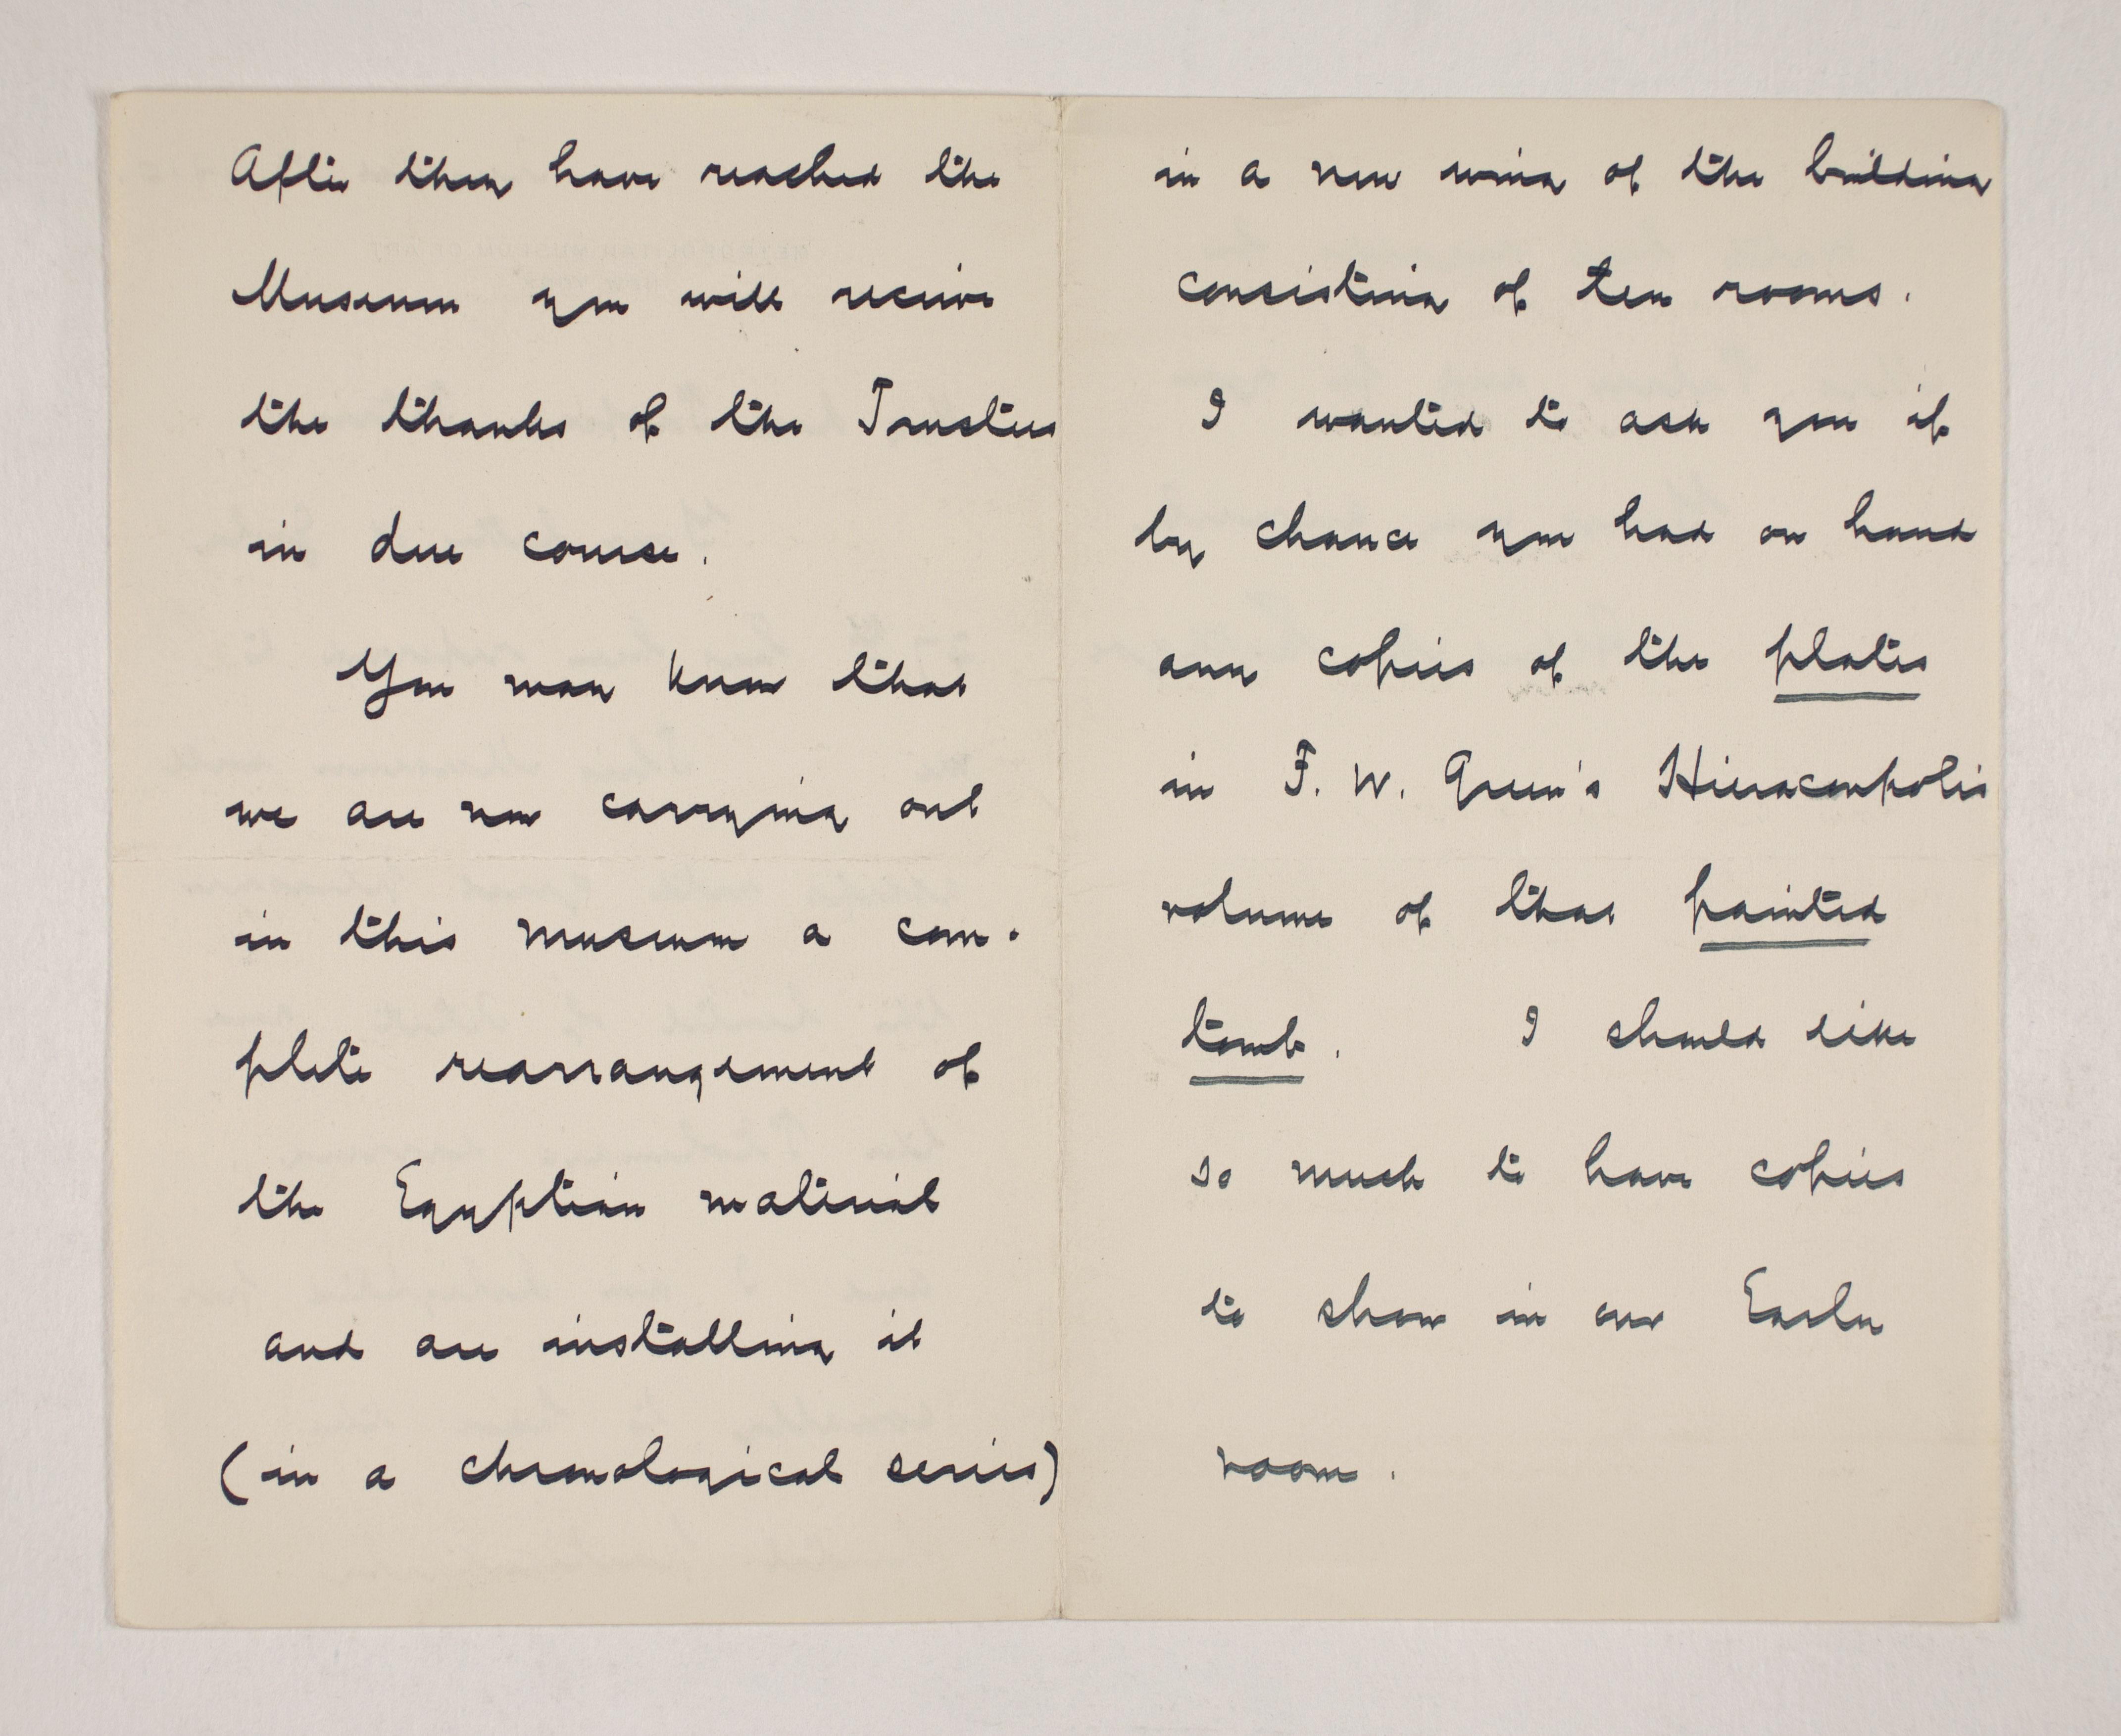 1909-10 Meidum, Memphis Correspondence PMA/WFP1/D/18/13.2